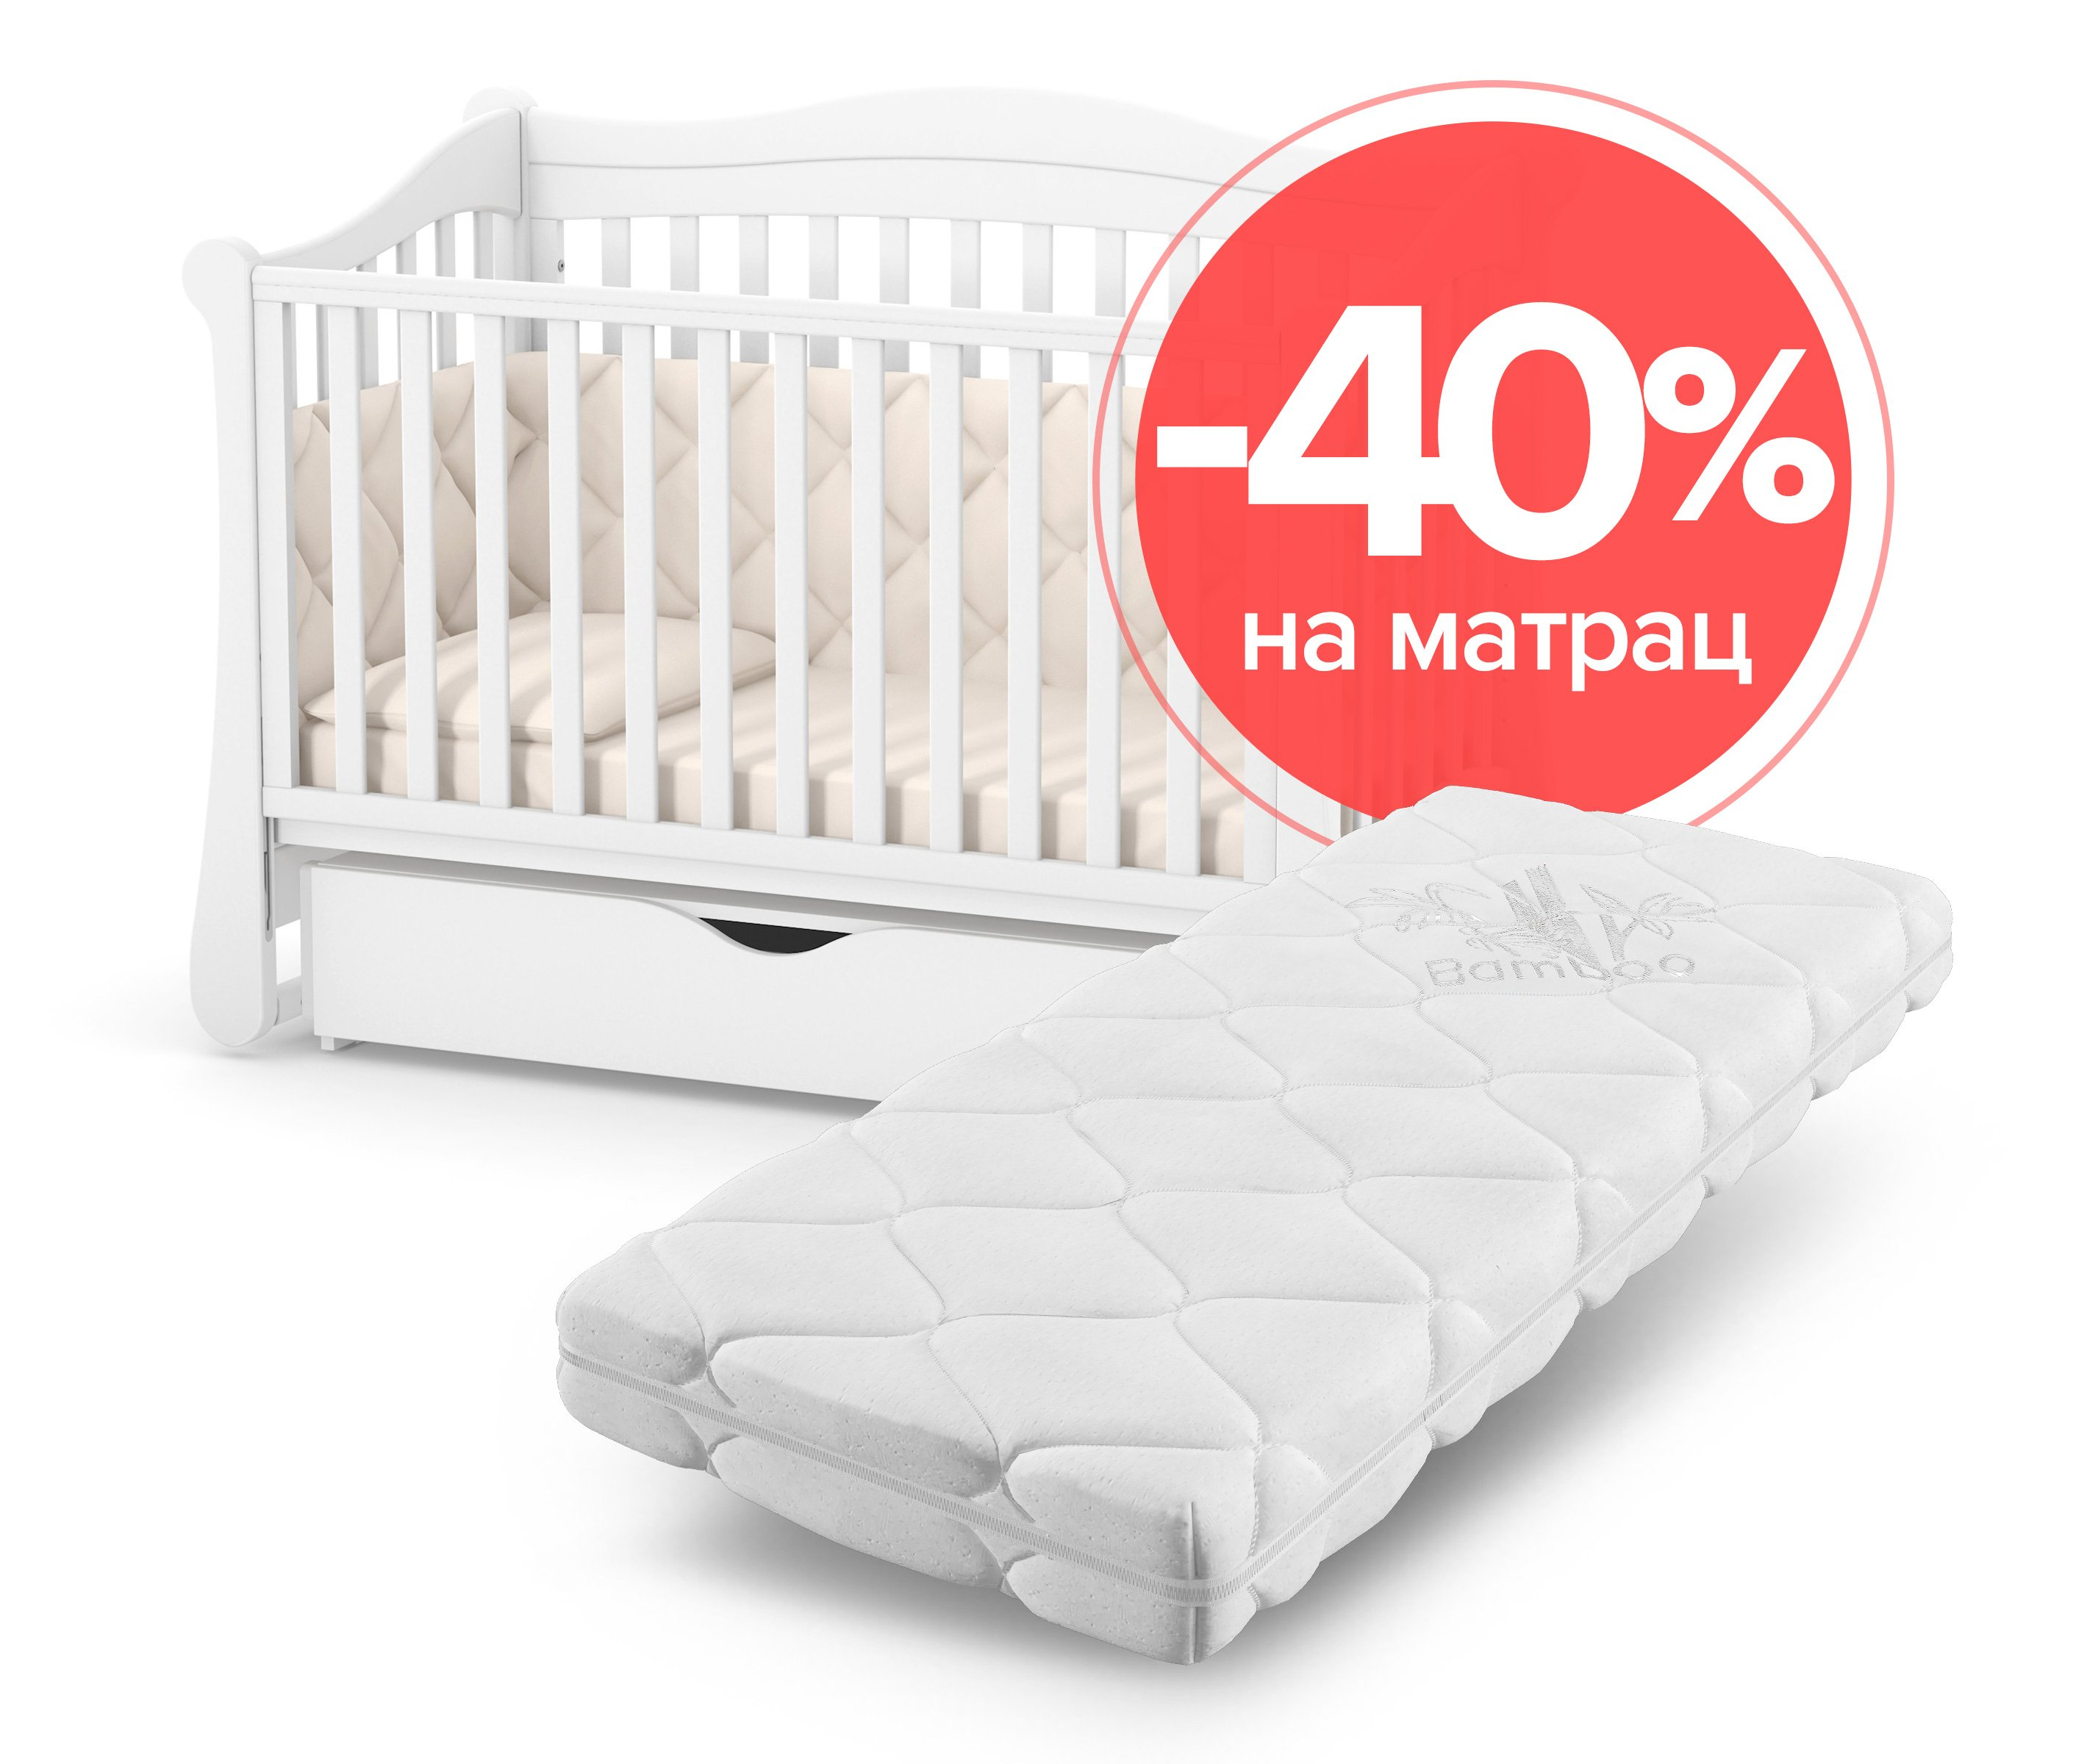 КОМПЛЕКТ:  кроватка СОНЯ ЛД 18 + матрасик